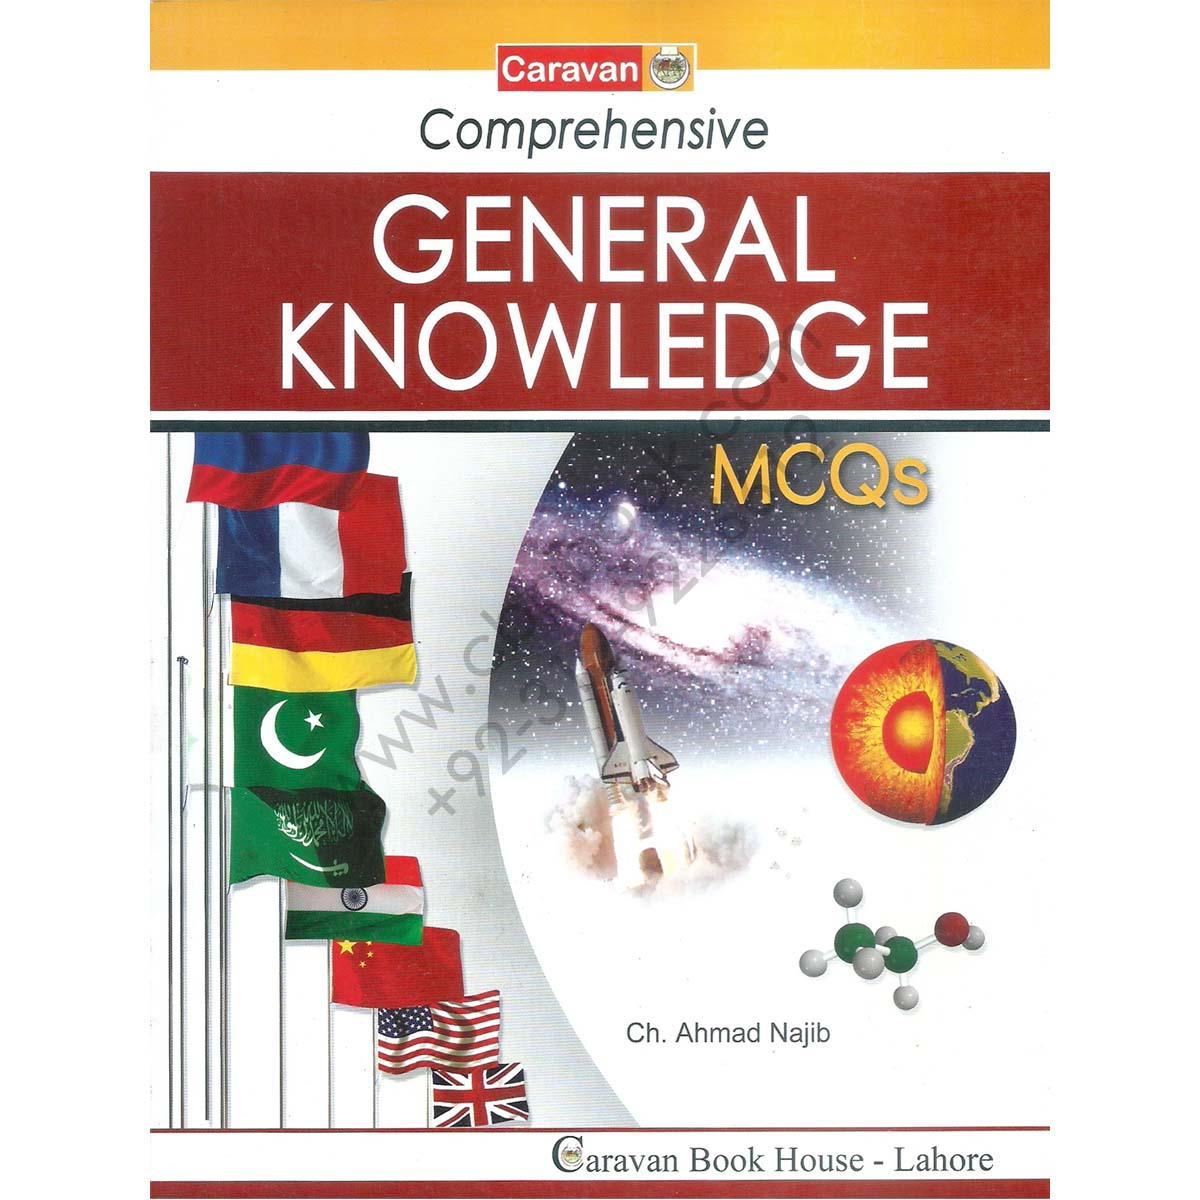 Caravan GK Book PDF 2019 MCQS by Ch Ahmed Najib Download